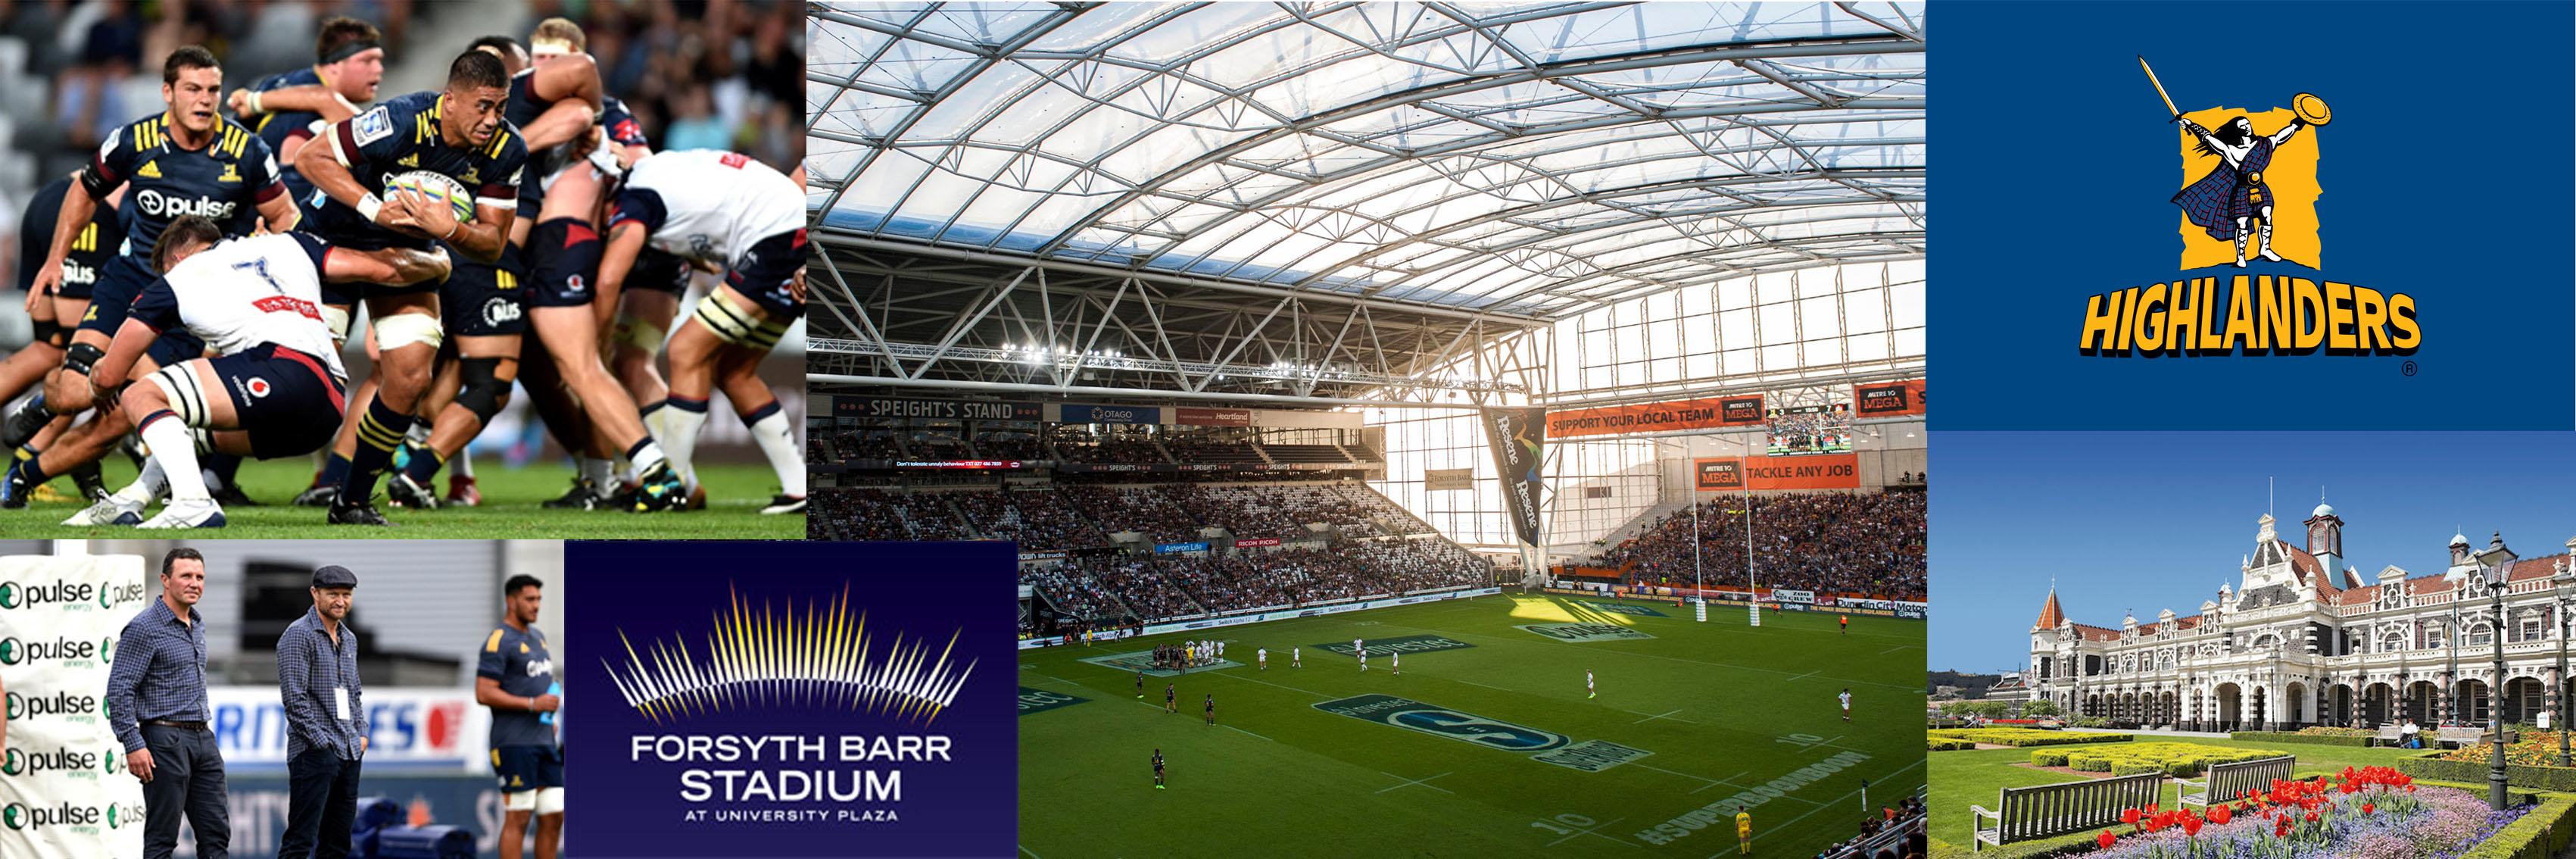 Highlanders & Forsyth Barr Stadium Experience 1250x450